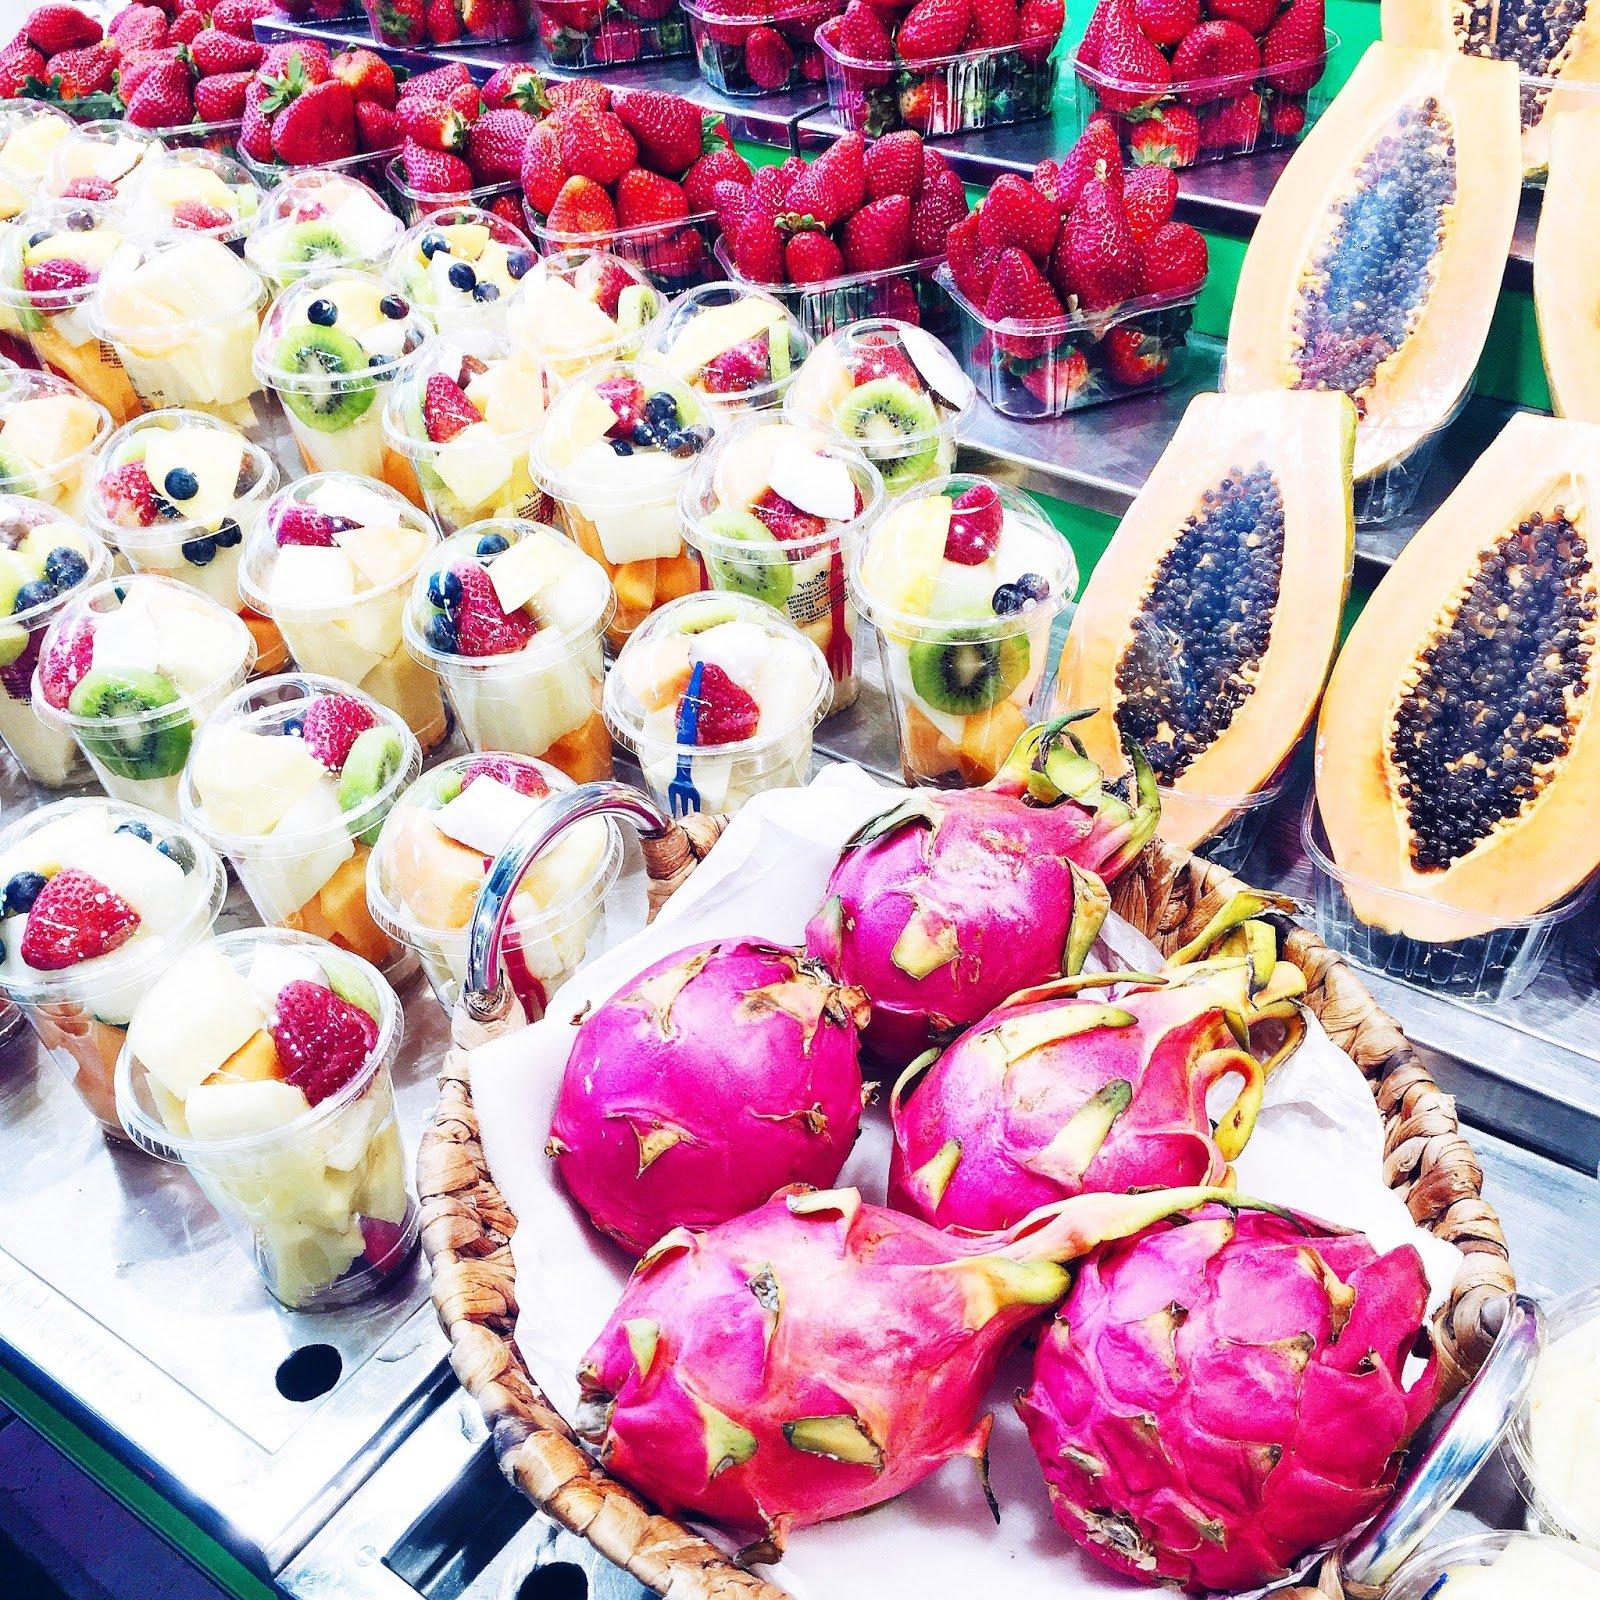 Barcelone Boqueria fruits